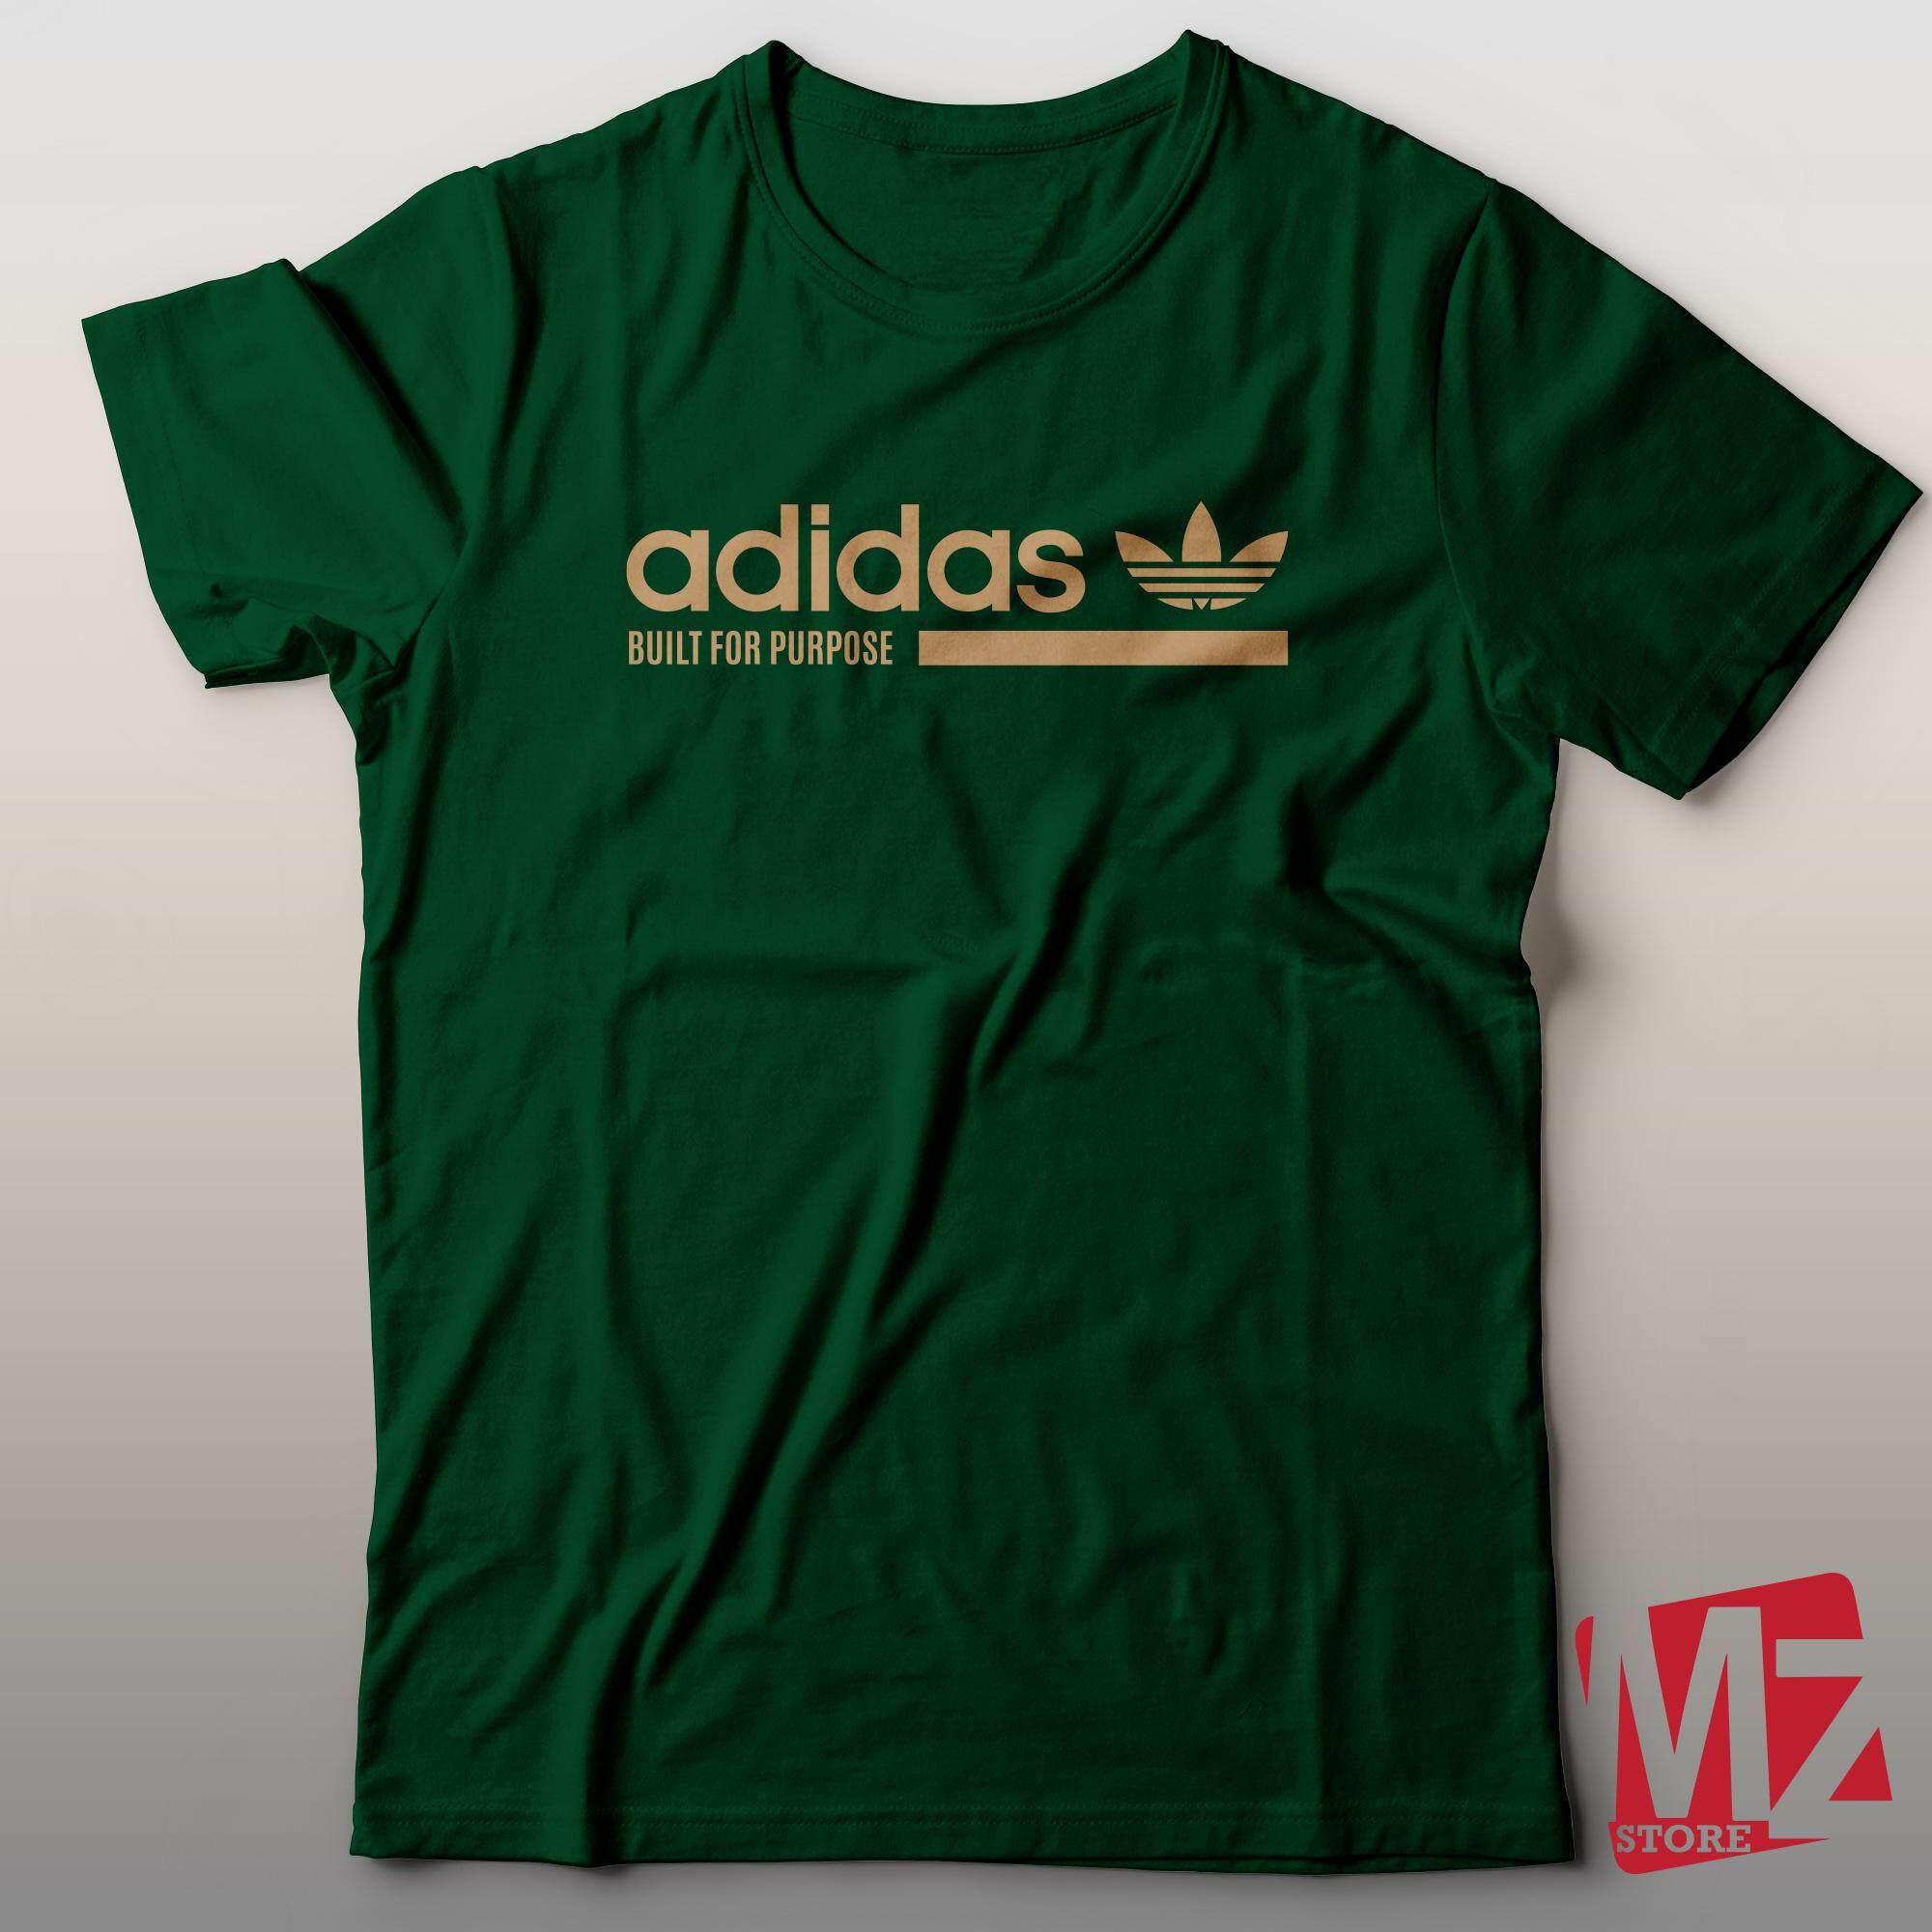 fae0eb3fd Custom T-Shirt Men's T-Shirts - T-Shirts price in Malaysia - Best ...